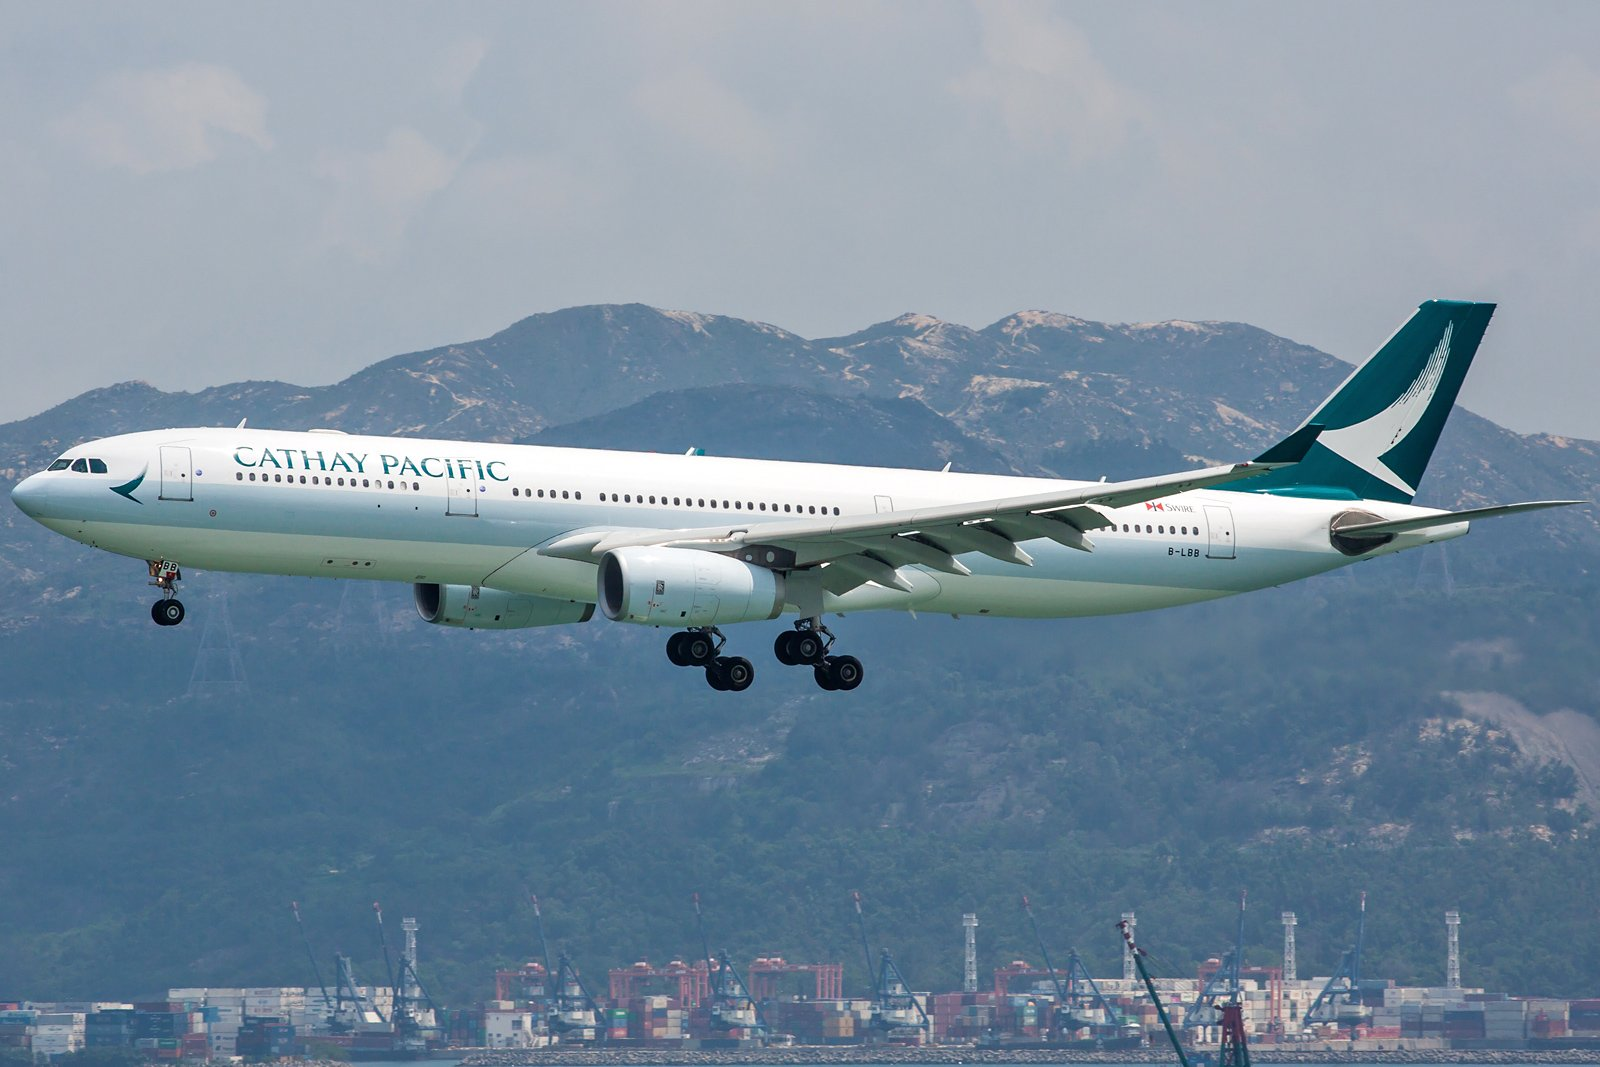 Cathay Pacific Airbus A330-343 B-LBB